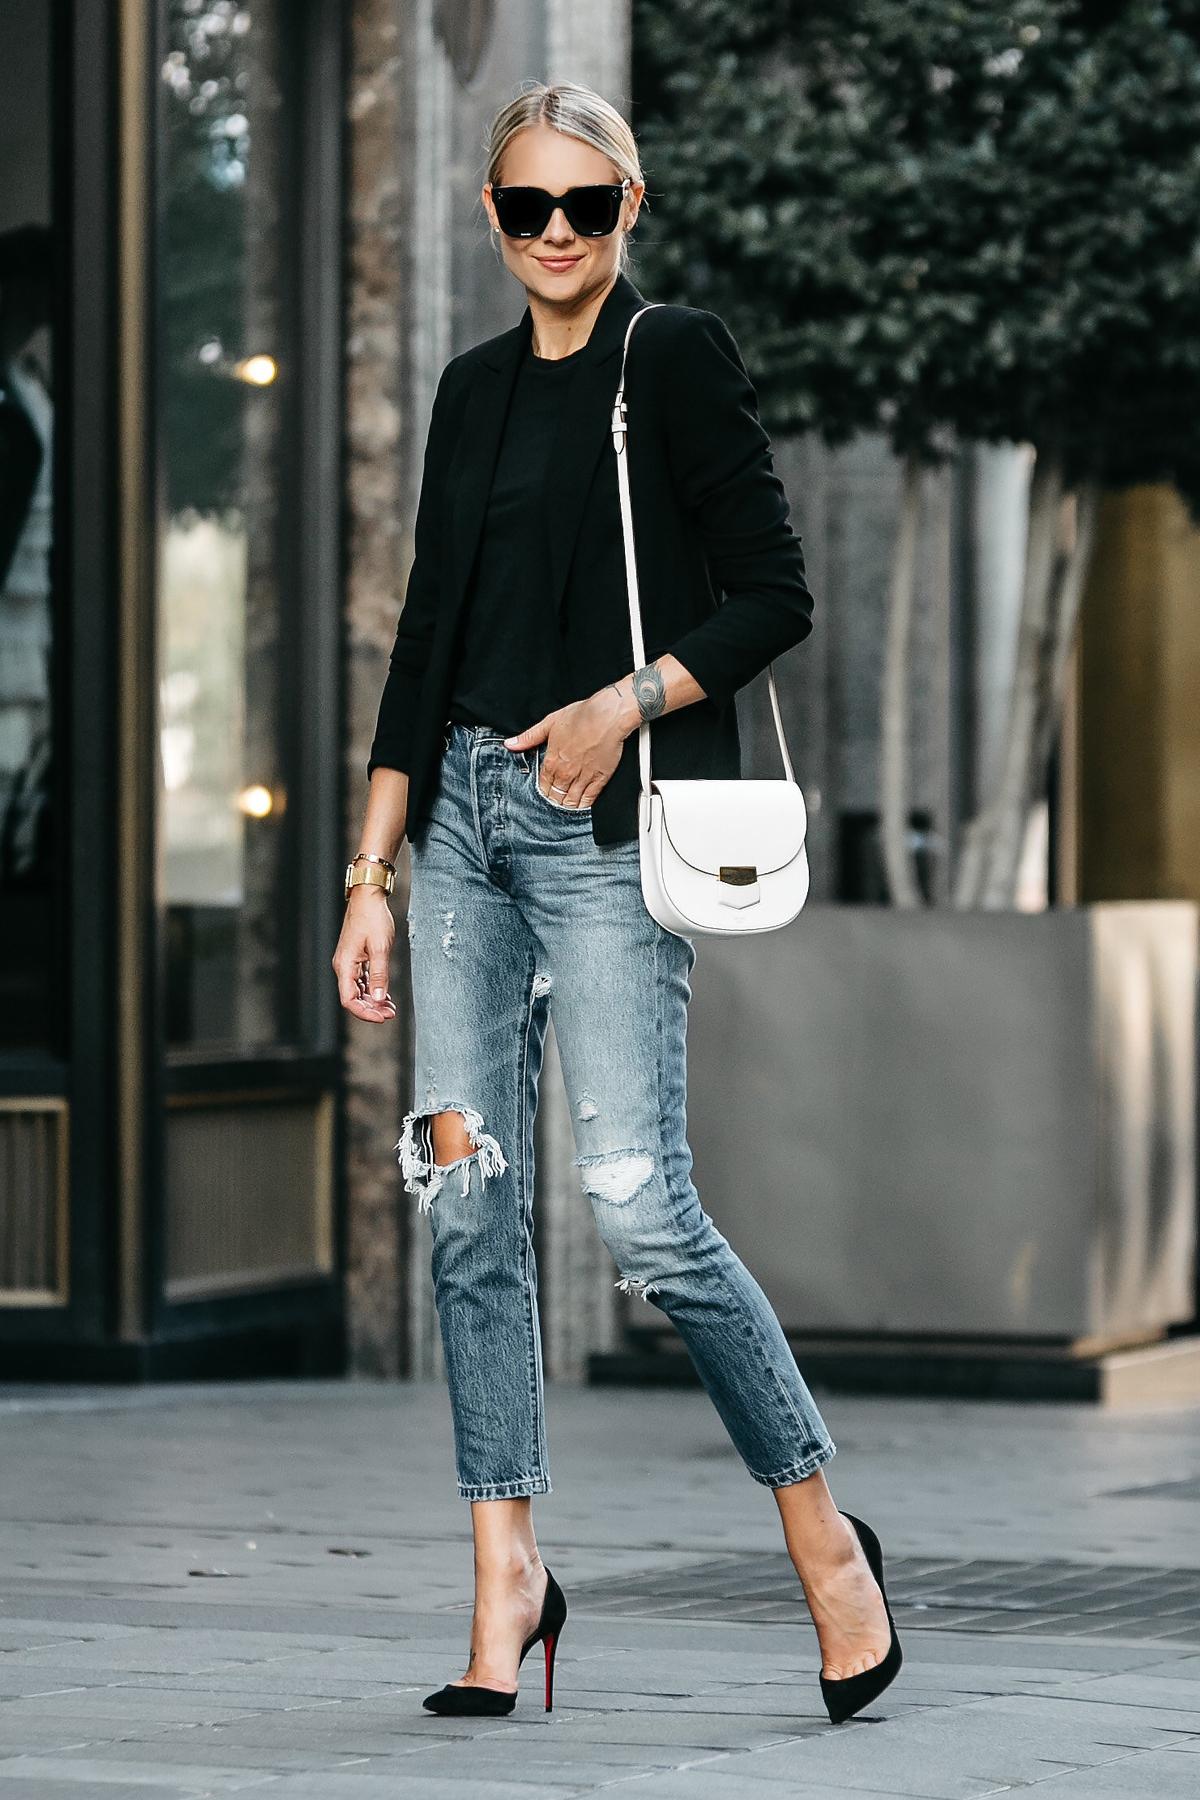 Blonde Woman Wearing Black Blazer Black Tshirt Denim Ripped Jeans Outfit Christian Louboutin Black Pumps Celine Trotteur White Handbag Fashion Jackson Dallas Blogger Fashion Blogger Street Style